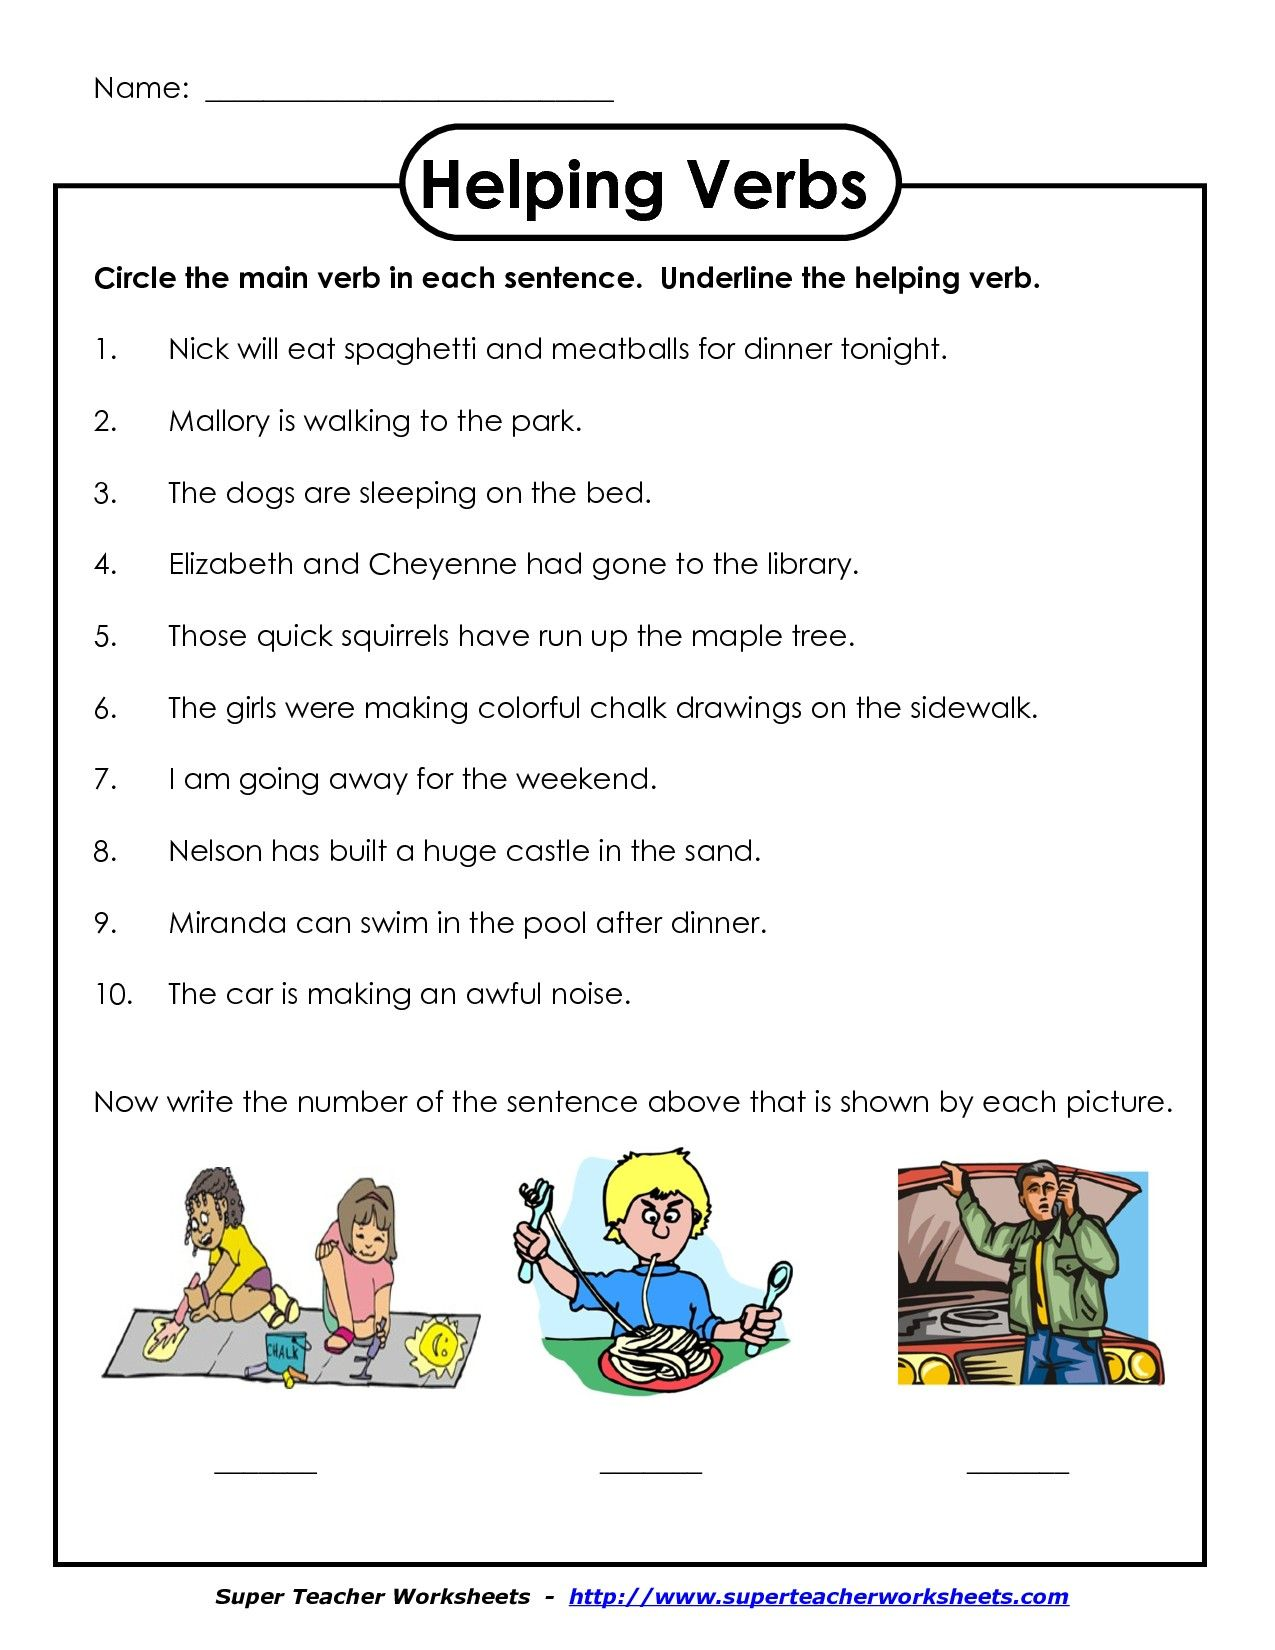 8 5th Grade Verb Worksheets Helping Verbs Worksheet Helping Verbs Verb Worksheets [ 1650 x 1275 Pixel ]